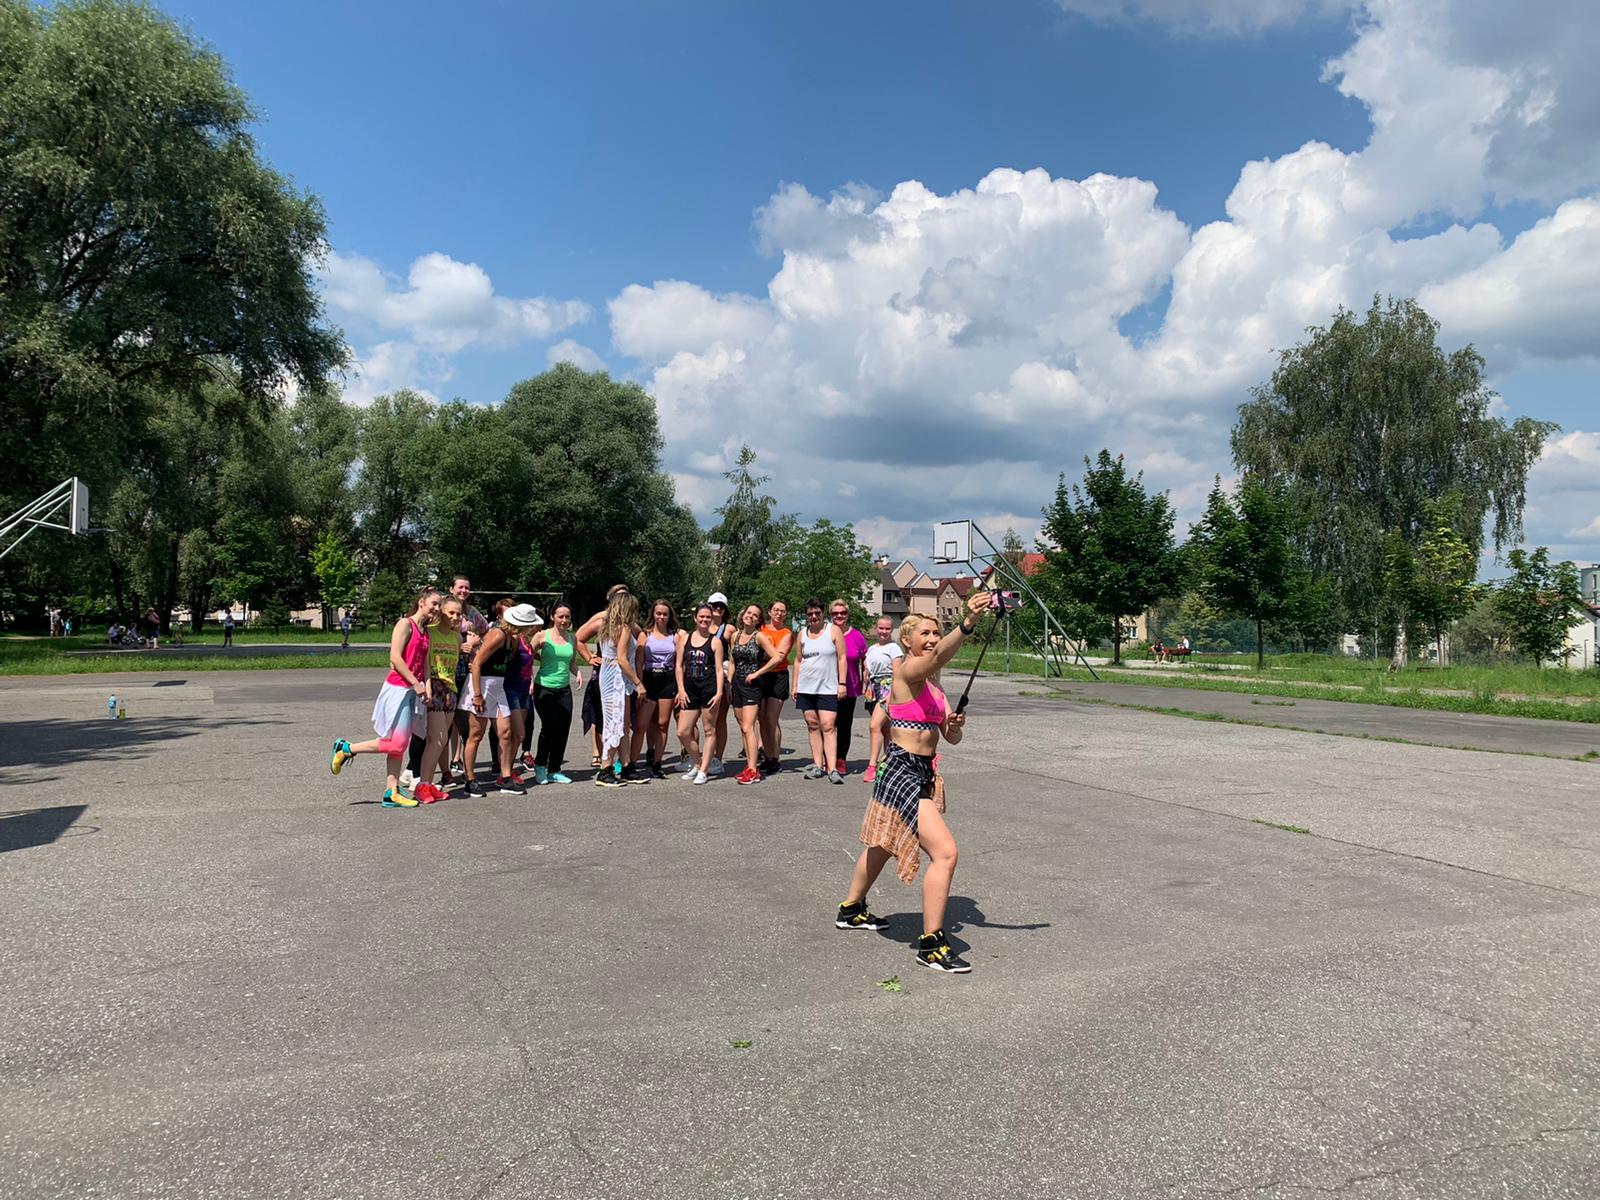 Maraton Zumba w plenerze - SUMMER PARTY 2.0 - 4.07.2020